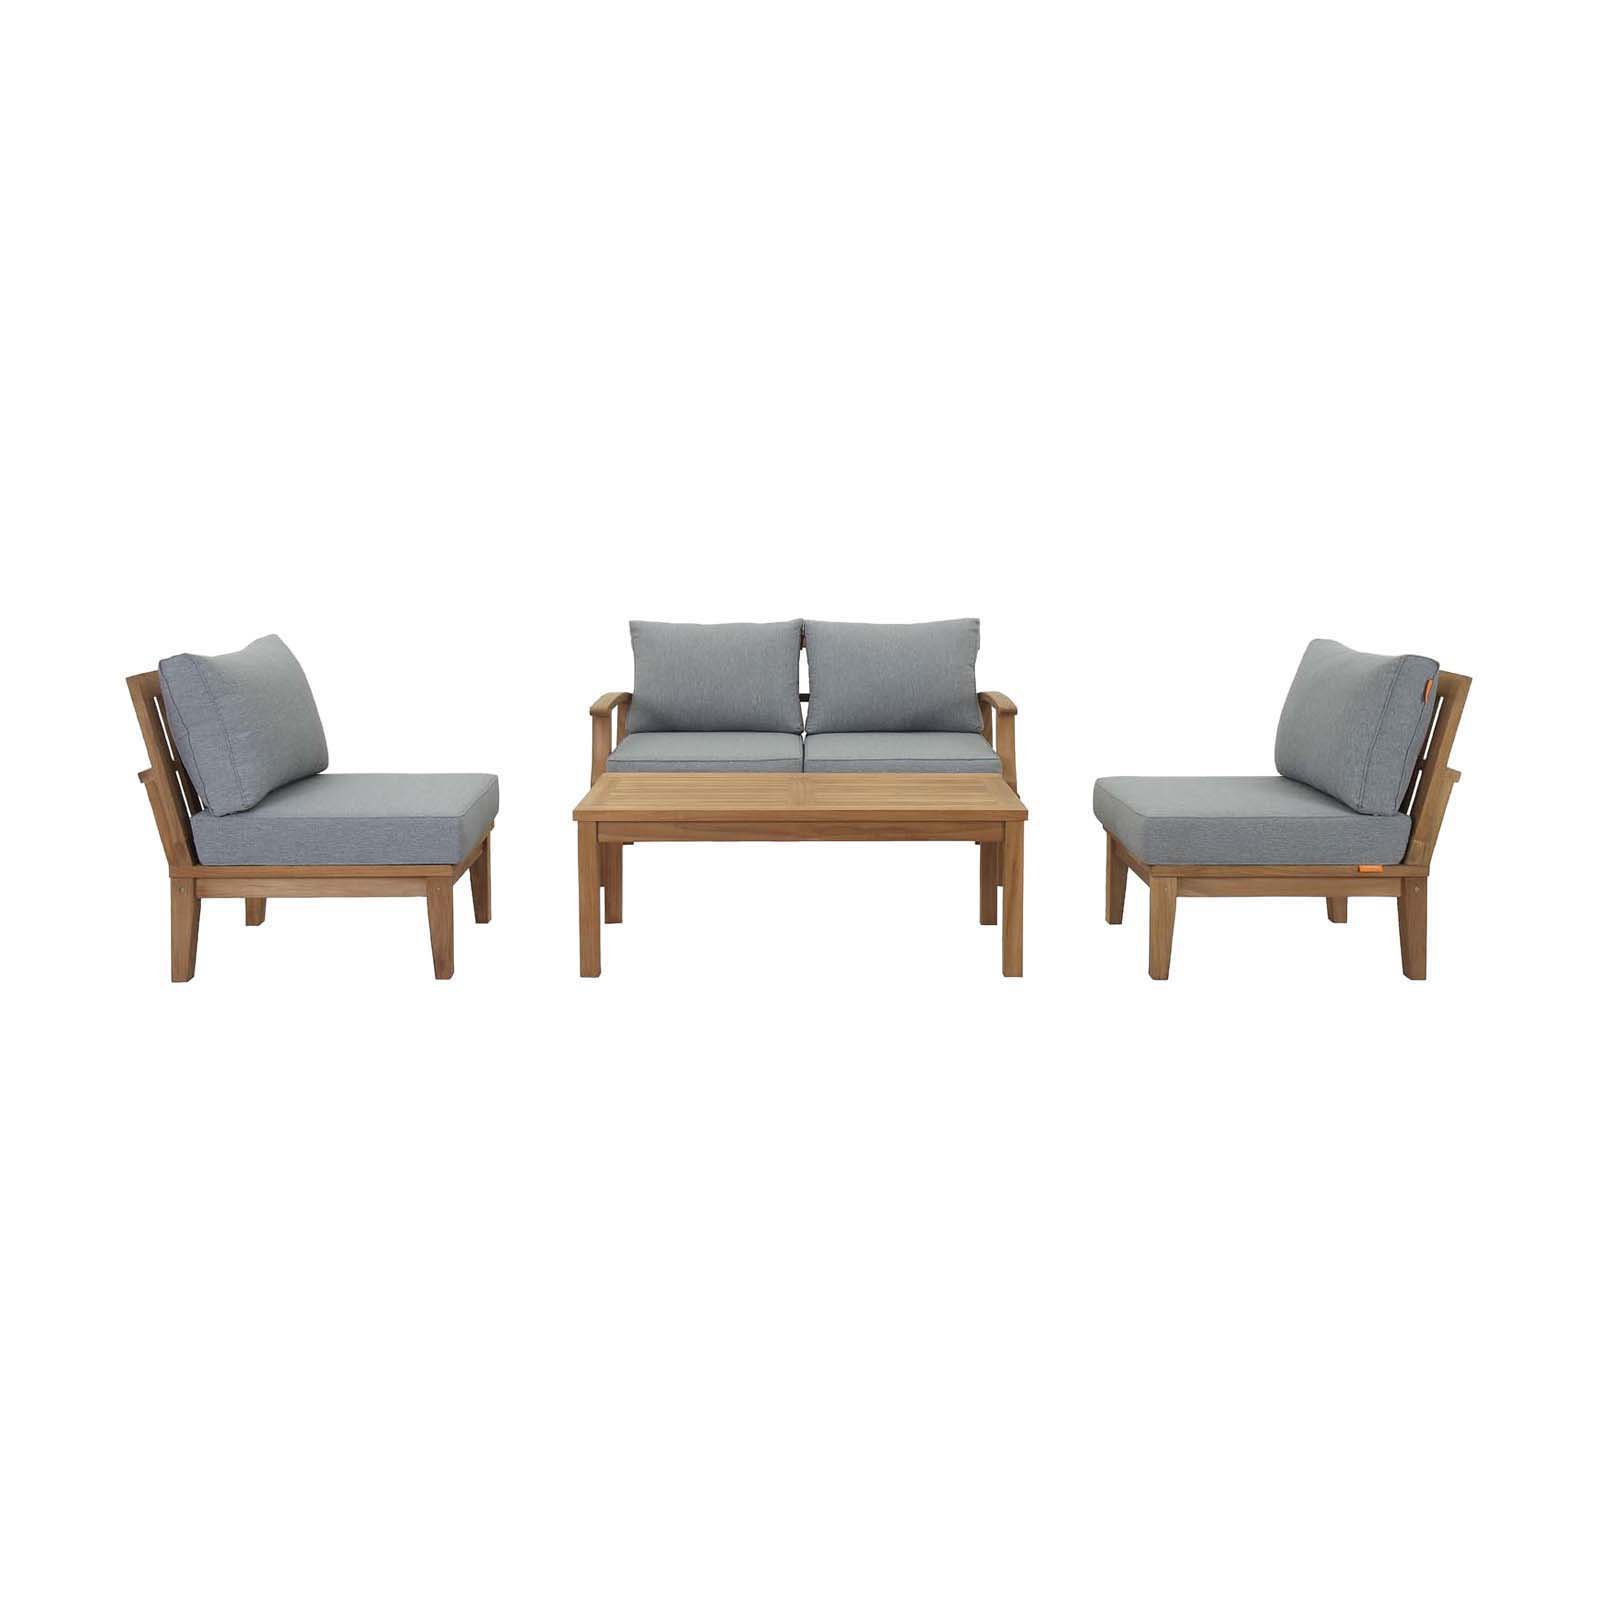 Modway Marina 5 Piece Outdoor Patio Teak Sofa Set in Natural White